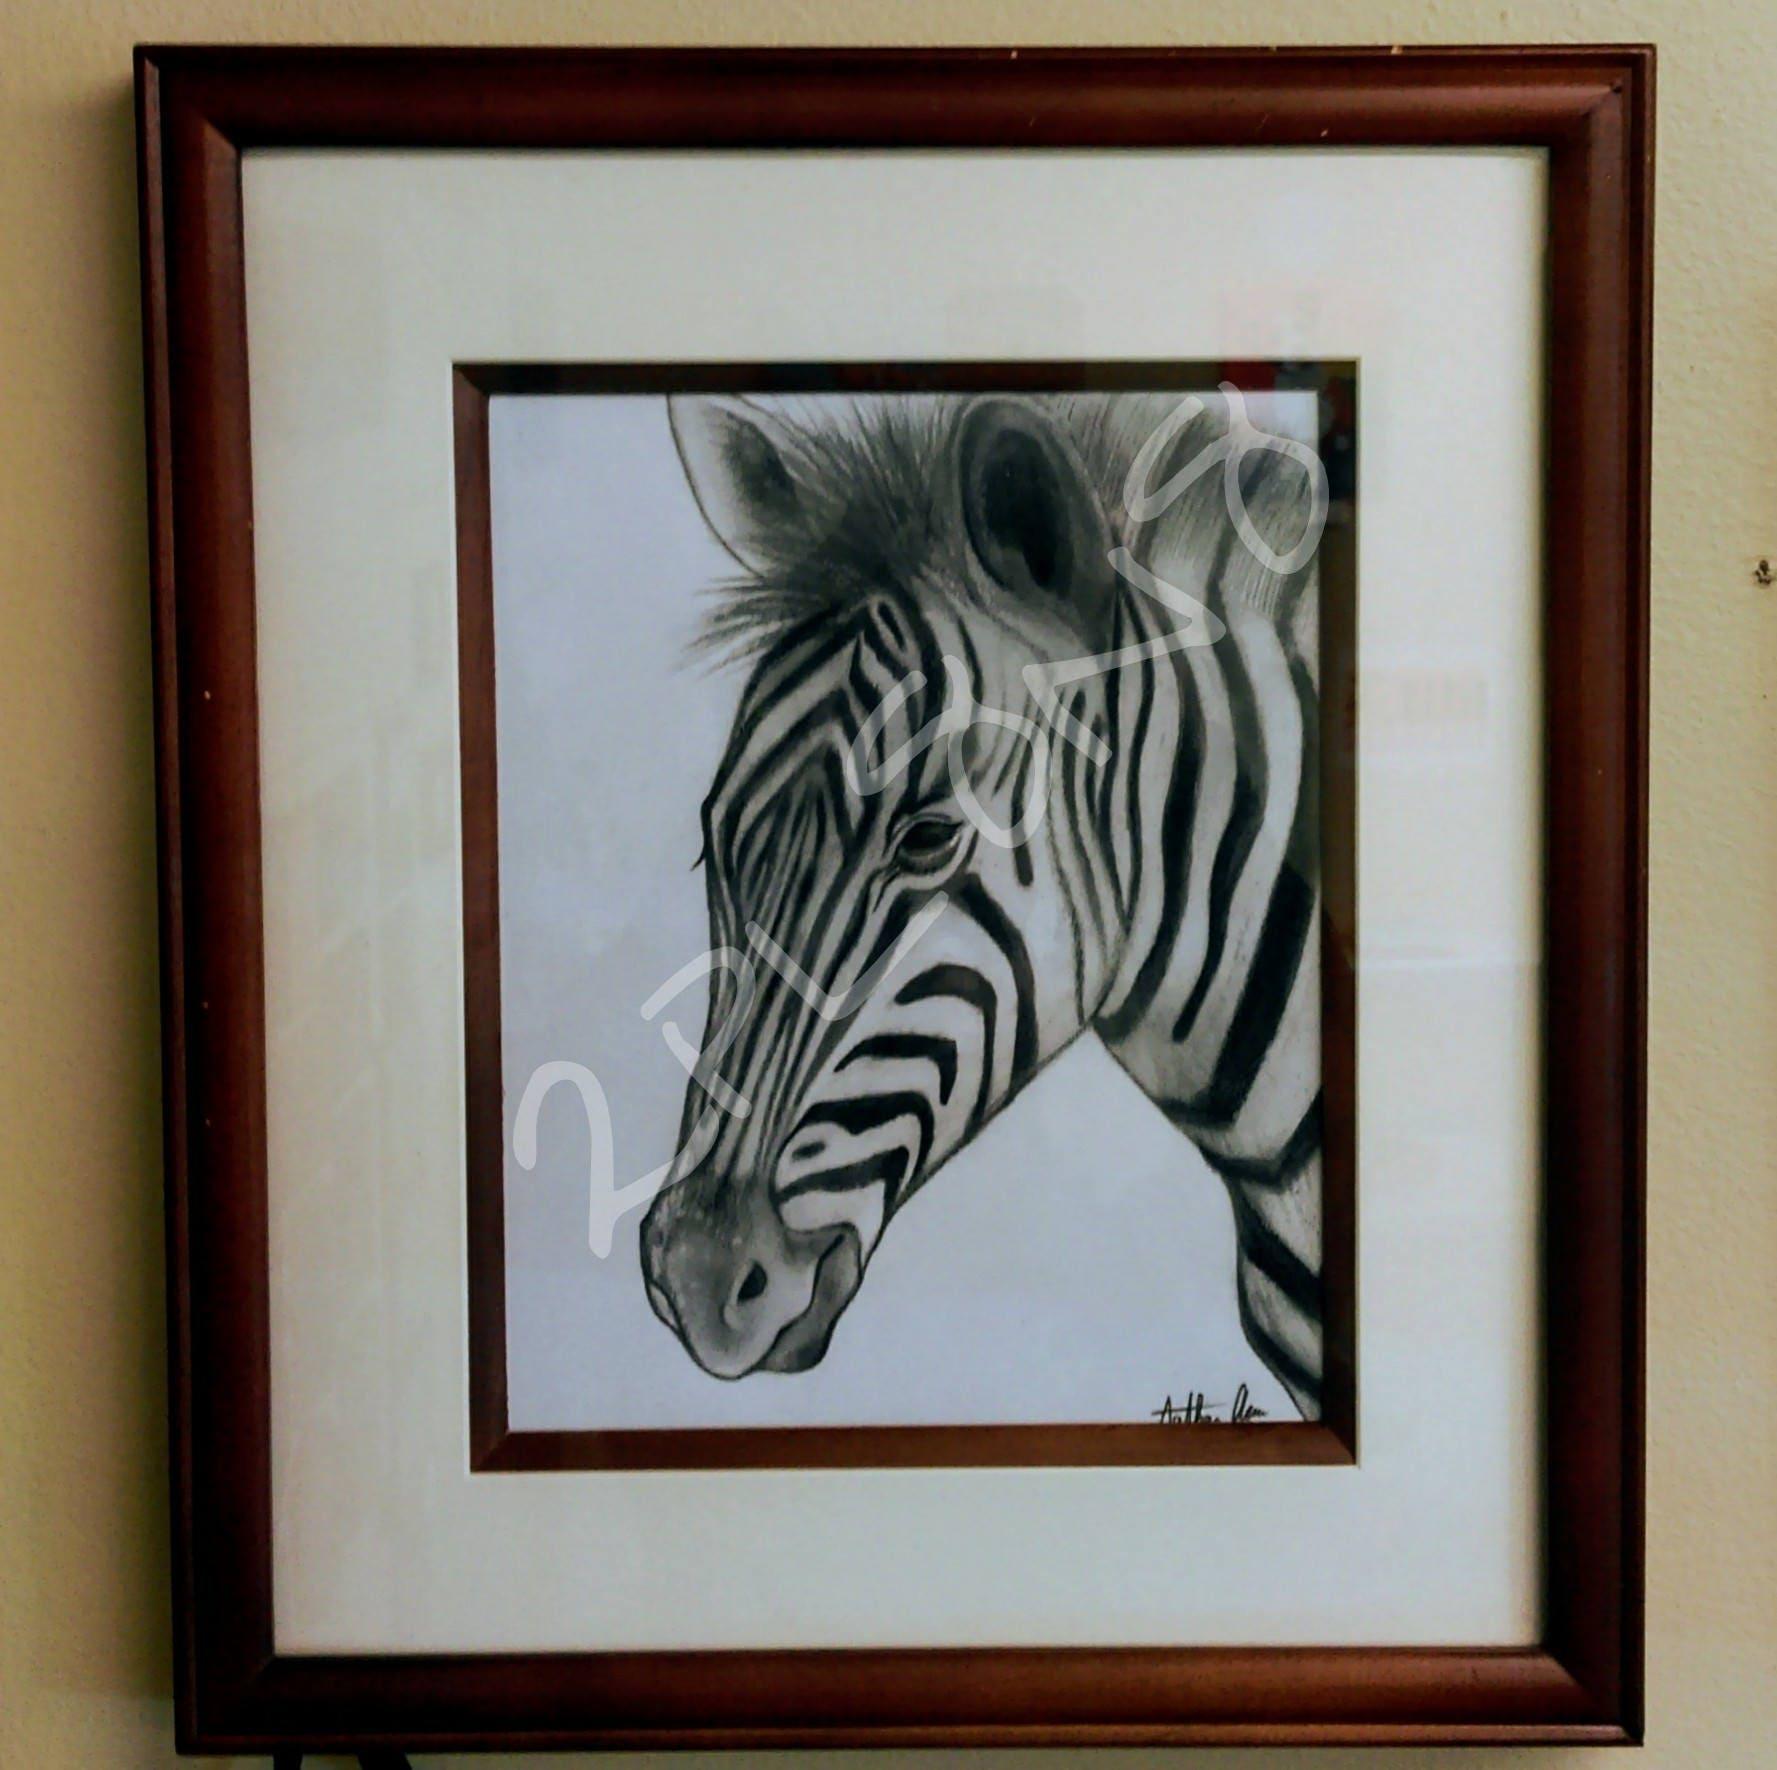 Framed Zebra Drawing by 2PL8N8